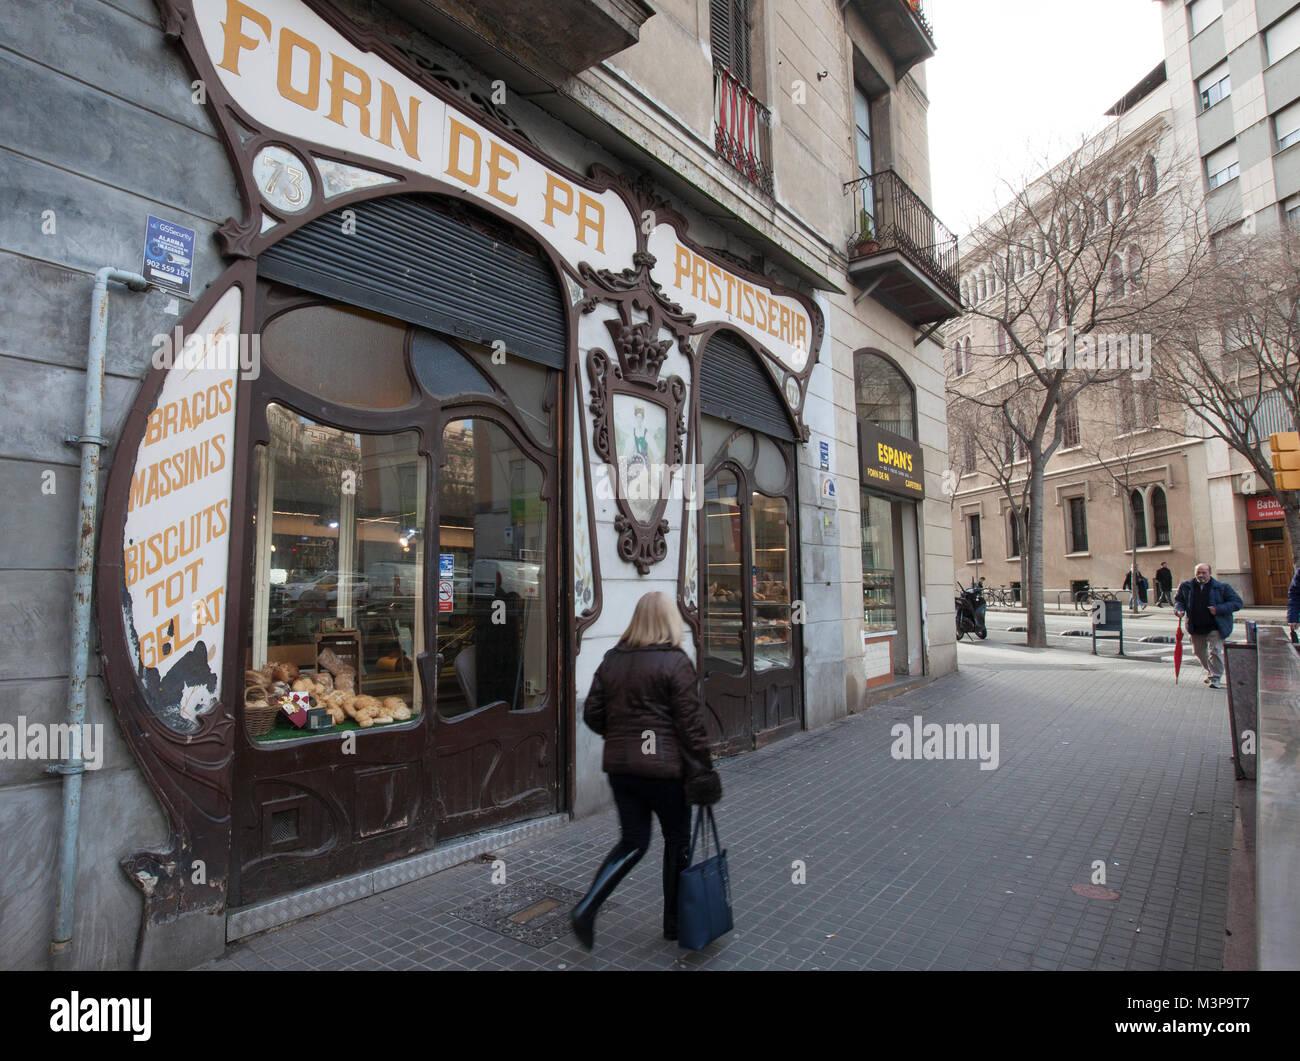 forn sarret, artisan bakery store front, art nouveau facade, barcelona, spain - Stock Image